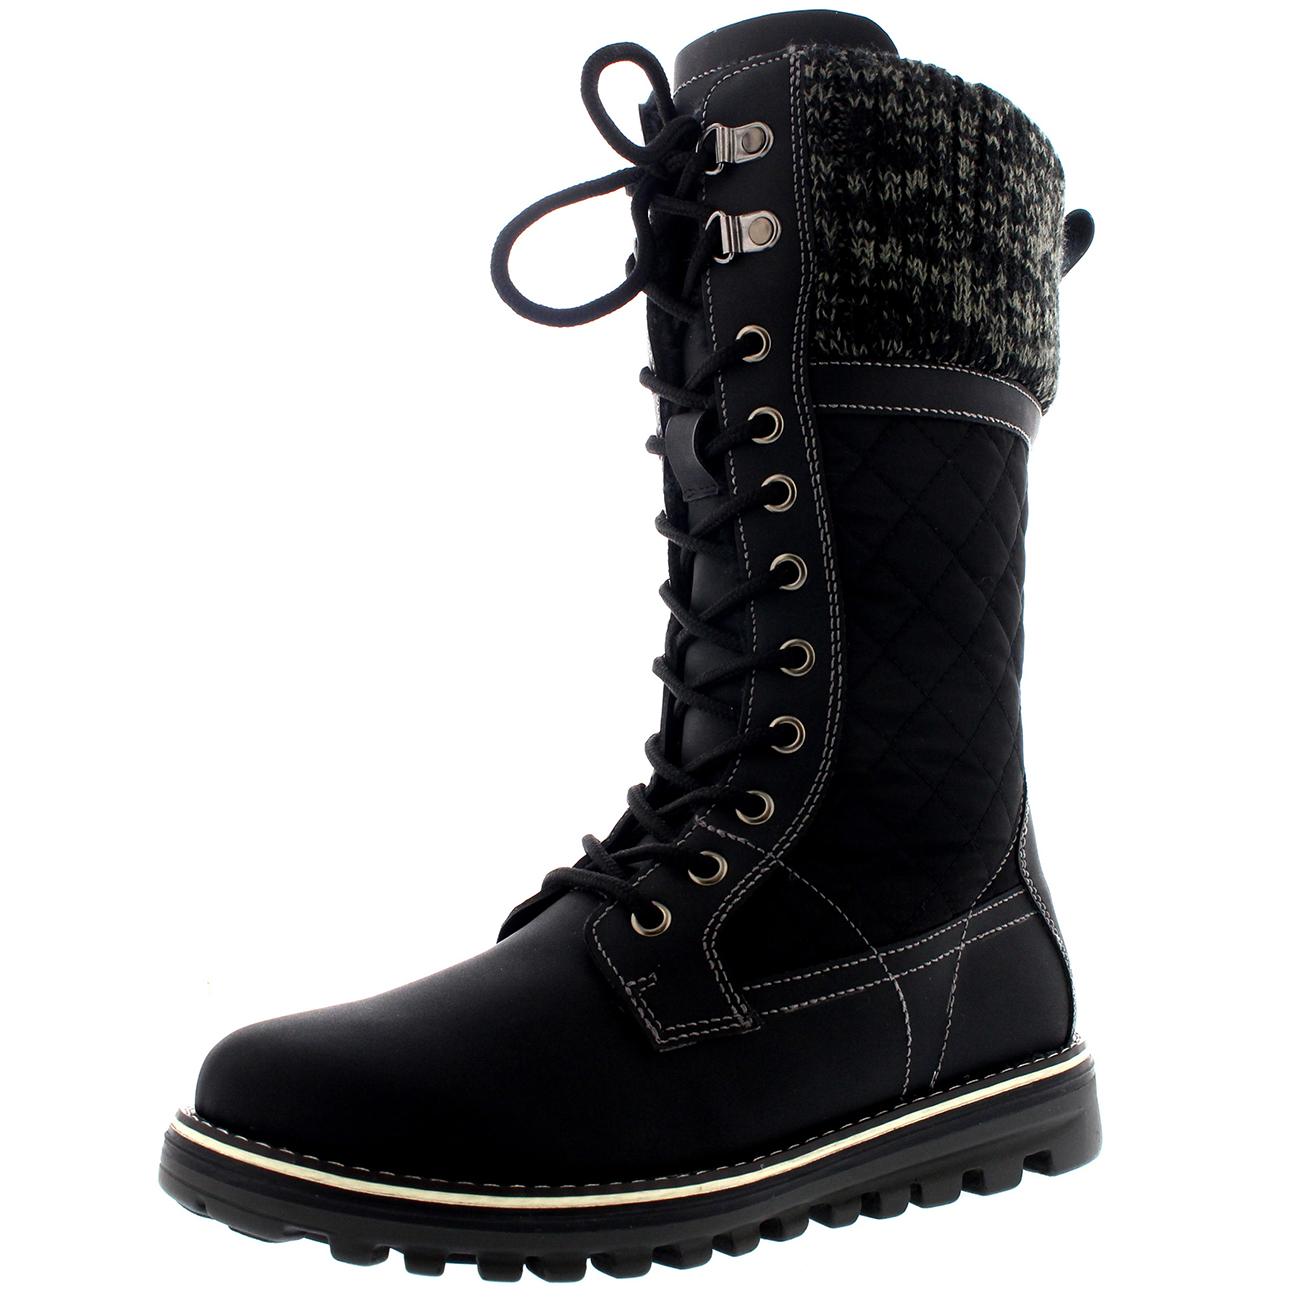 Ladies-Waterproof-Walking-Warm-Hiking-Snow-Rain-Winter-Mid-Calf-Boot-All-Sizes